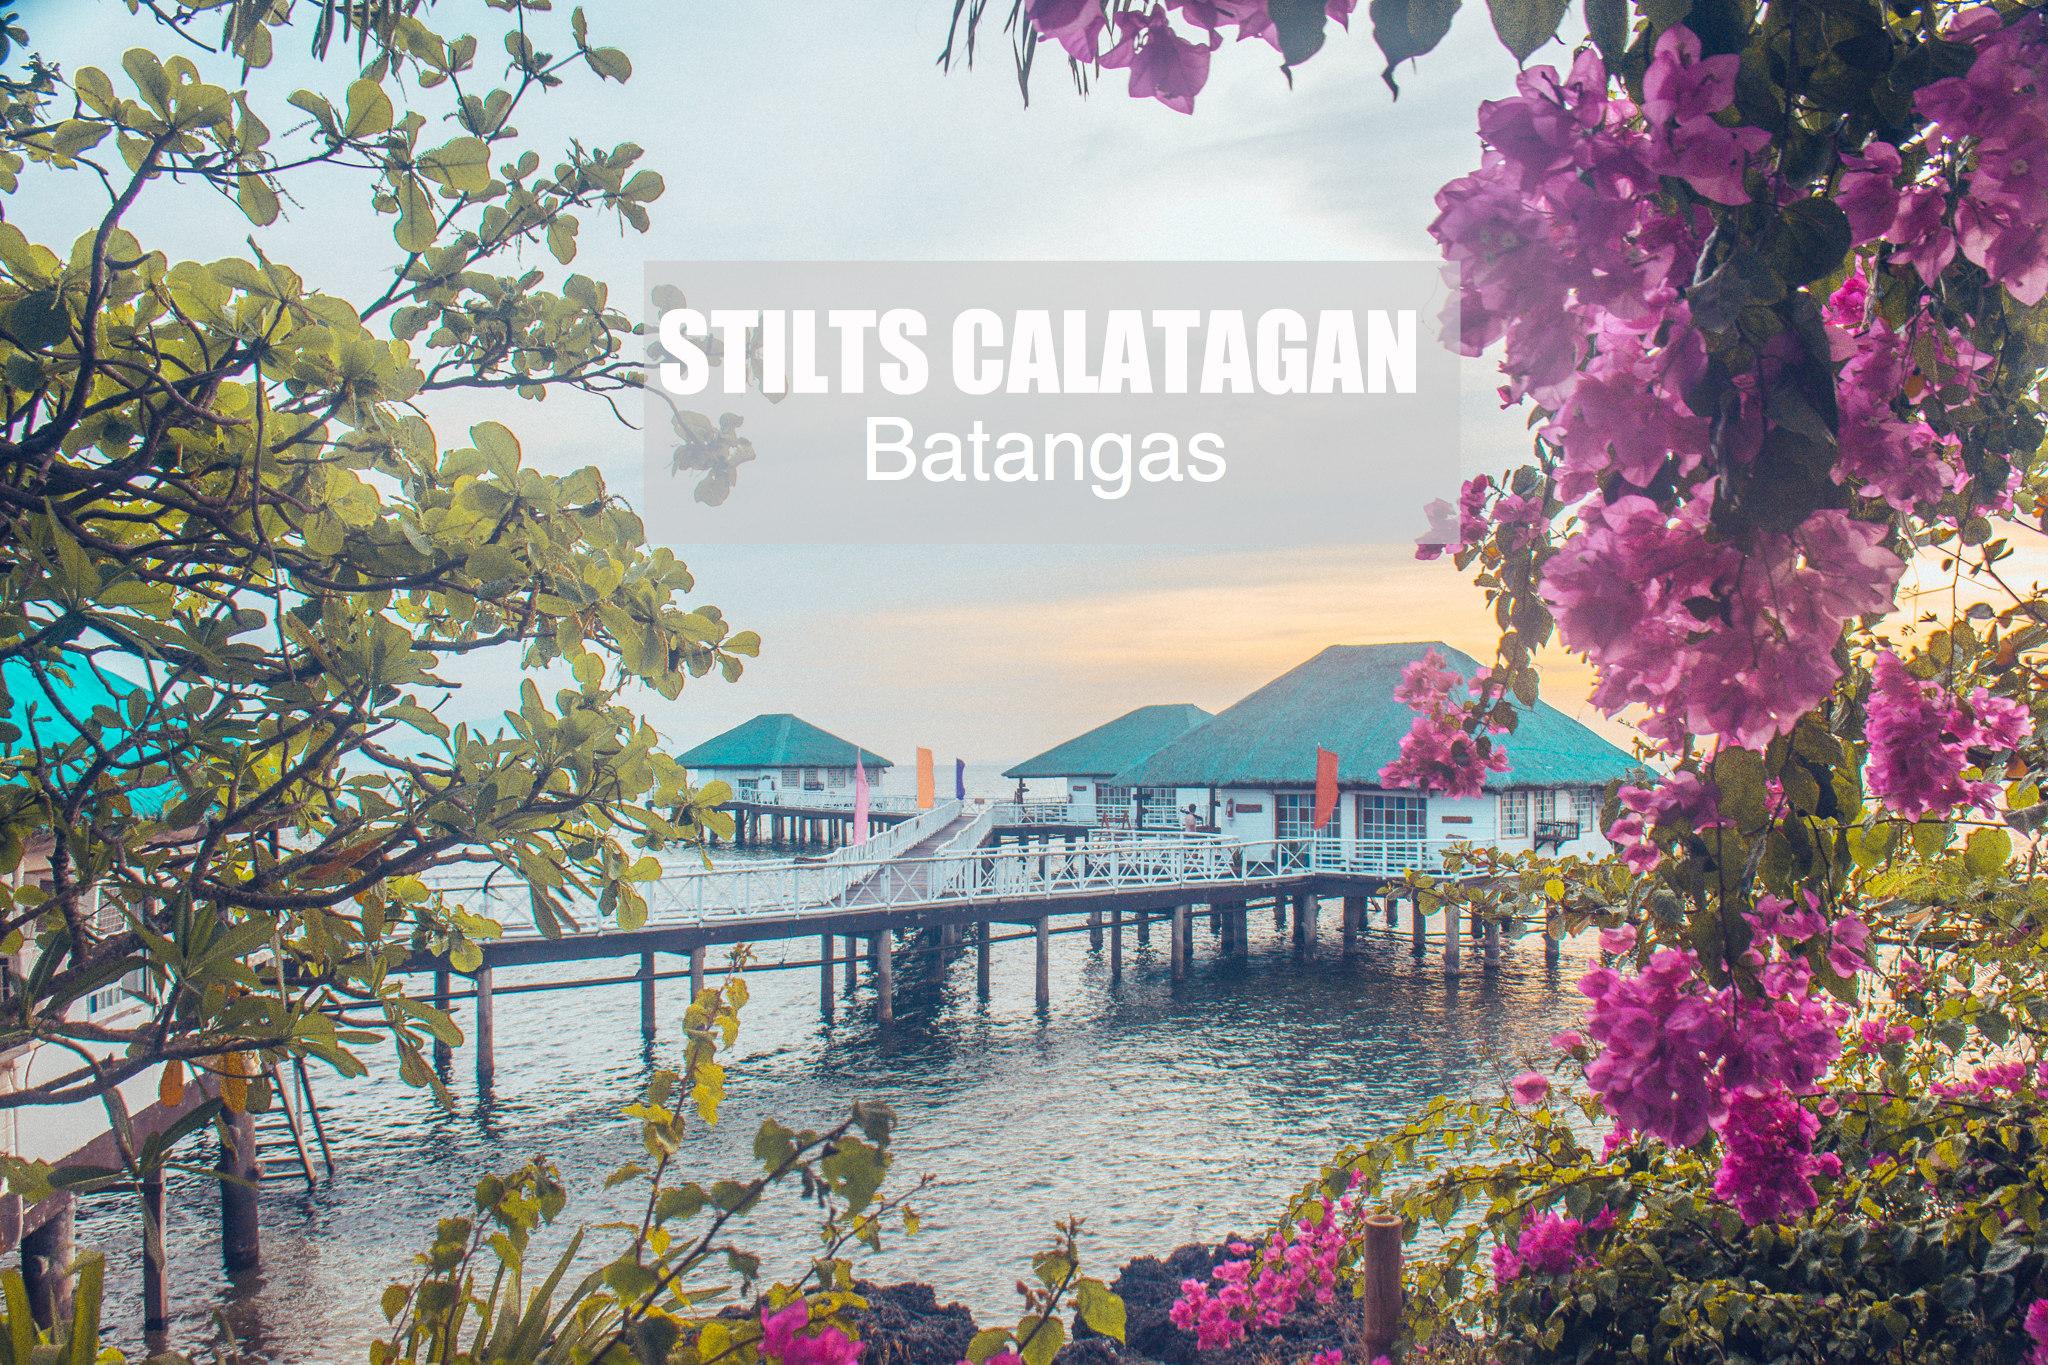 STILTS CALATAGAN BATANGAS: DIY TRAVEL GUIDE (Budget + Itinerary)